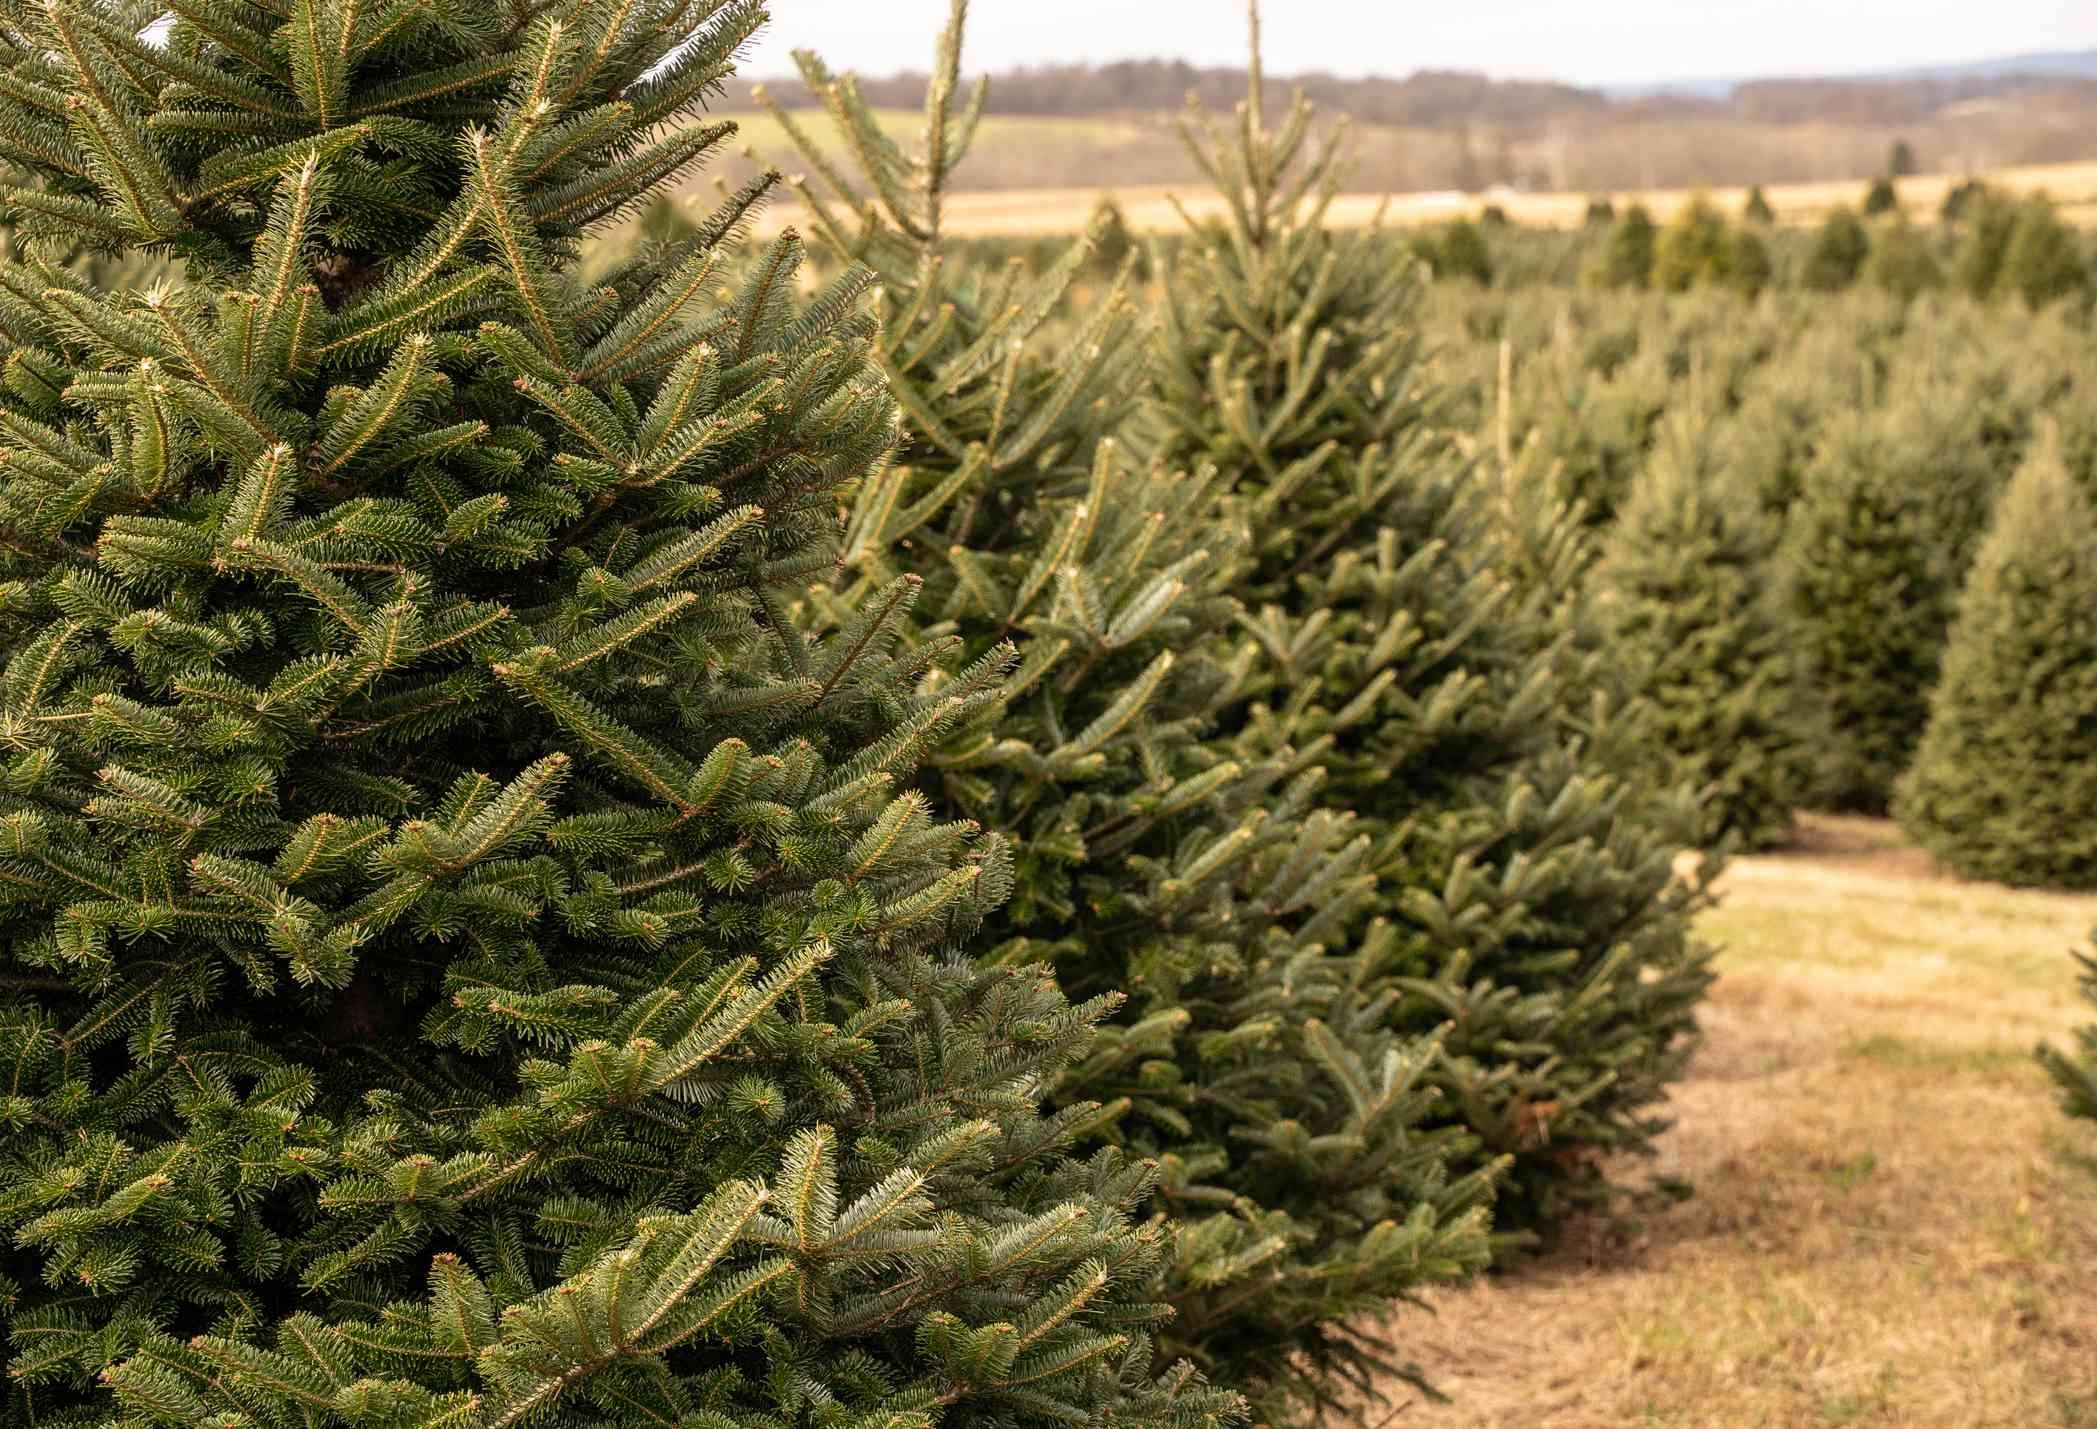 Rows of Christmas trees on tree farm